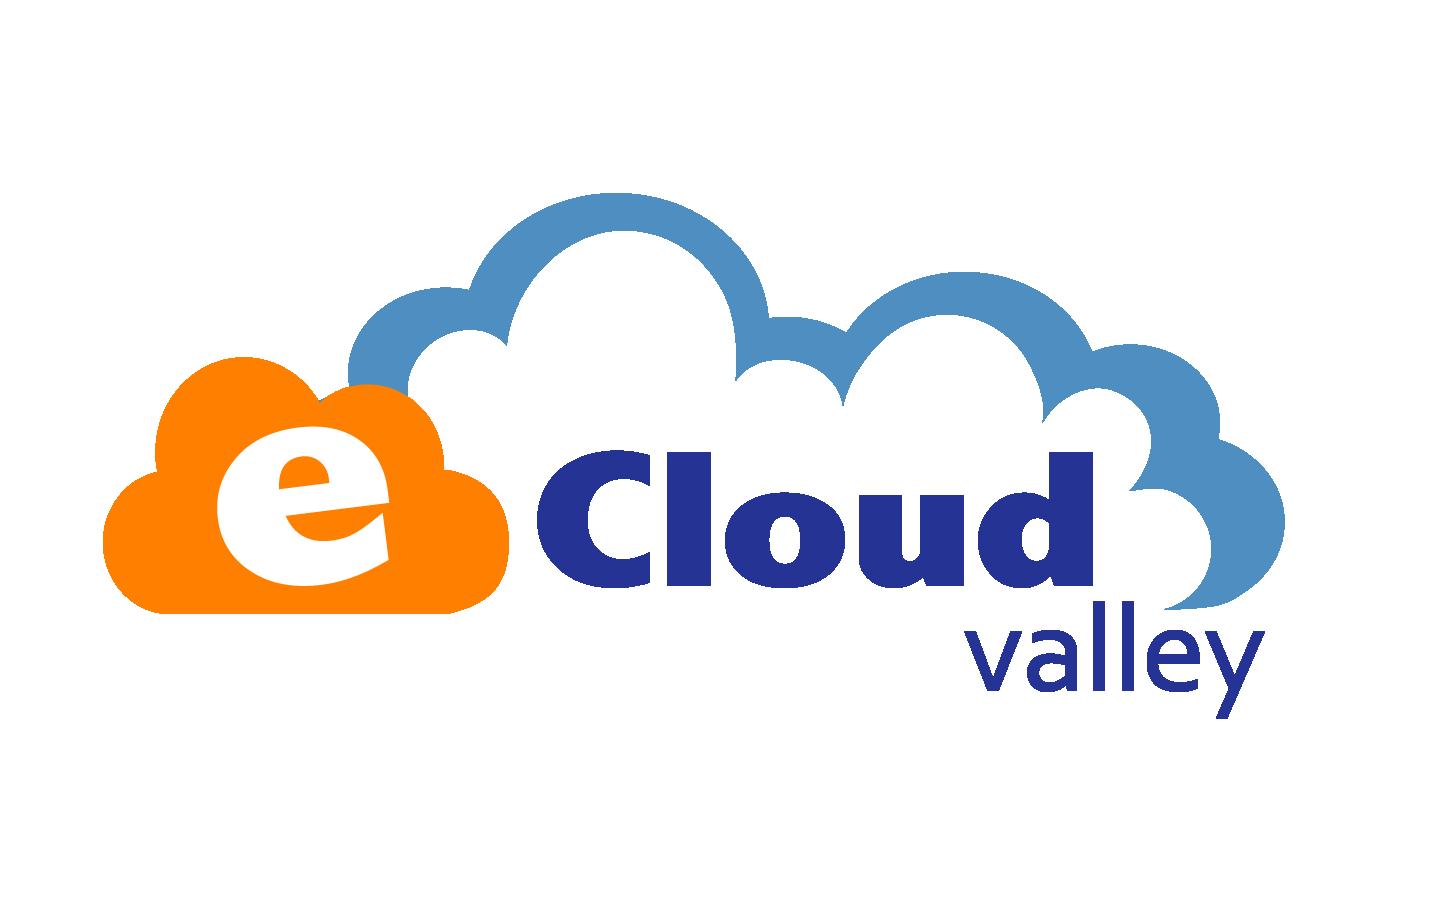 eCloudvalley Technology